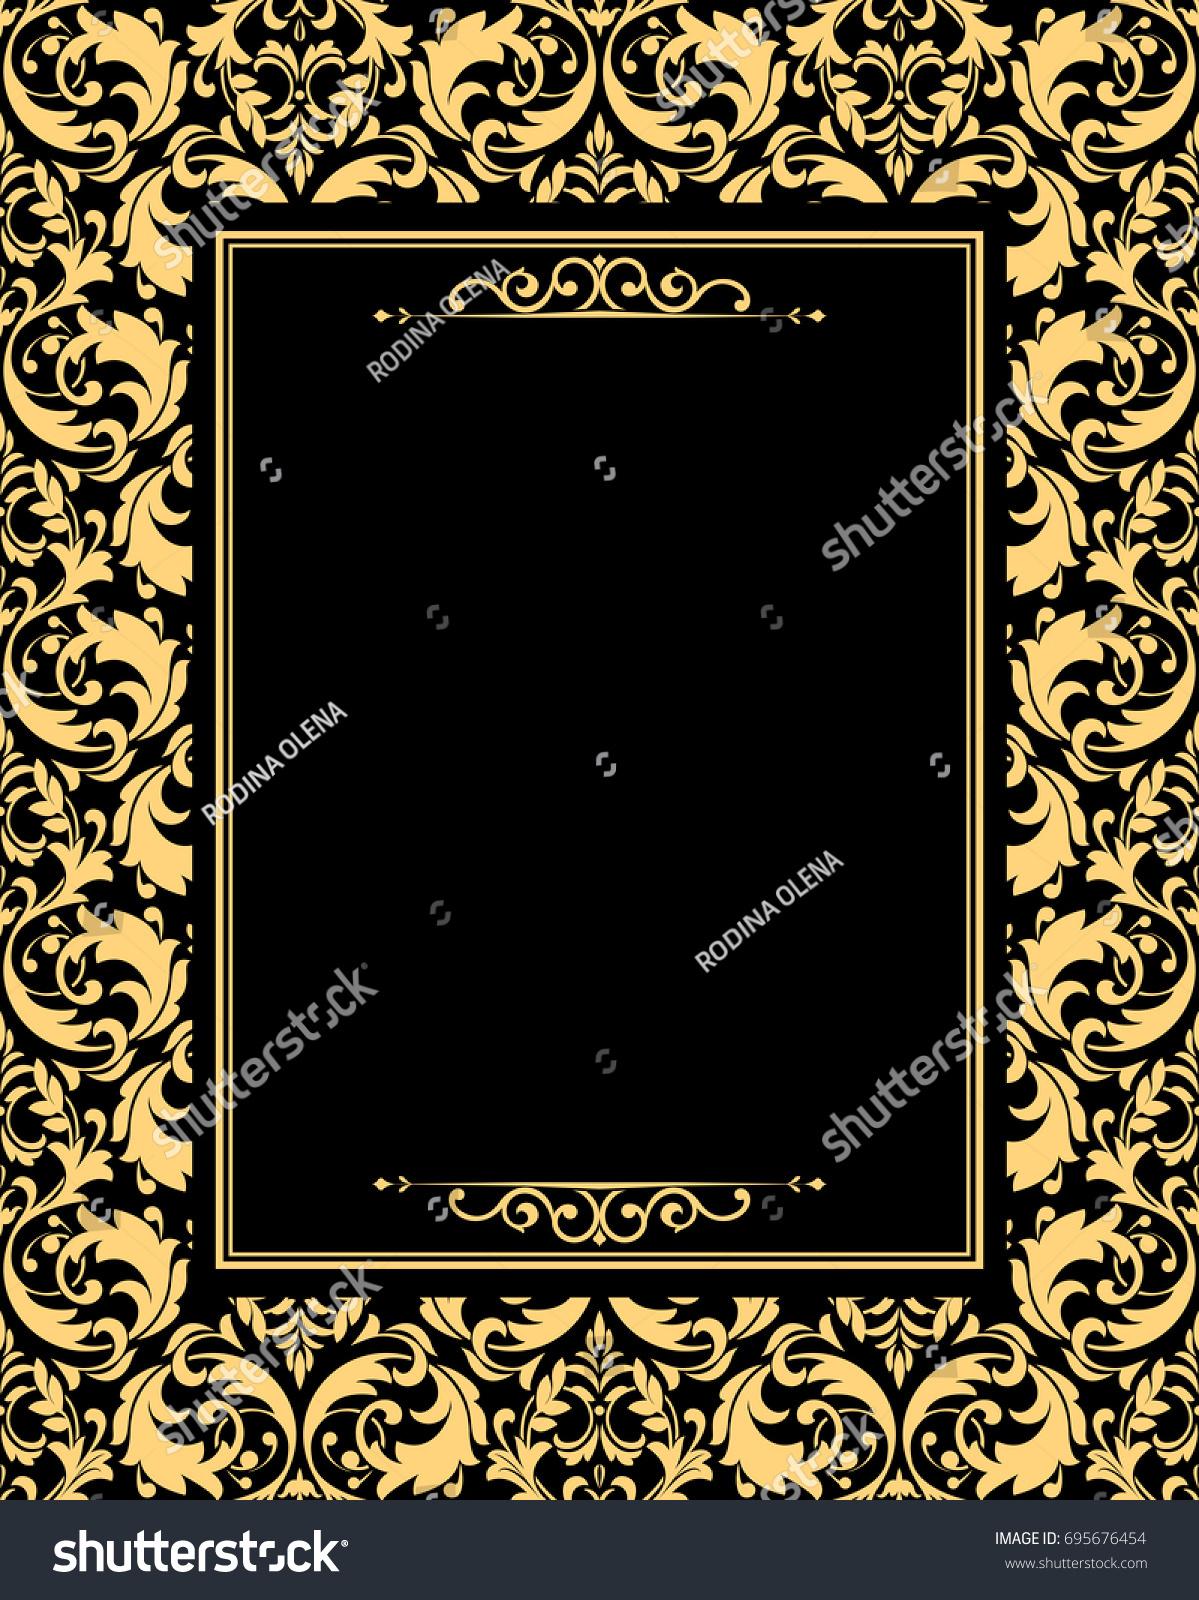 Vintage floral design graphic frame damask stock vector 695676454 vintage floral design graphic frame damask vector pattern gold and black pattern jeuxipadfo Image collections